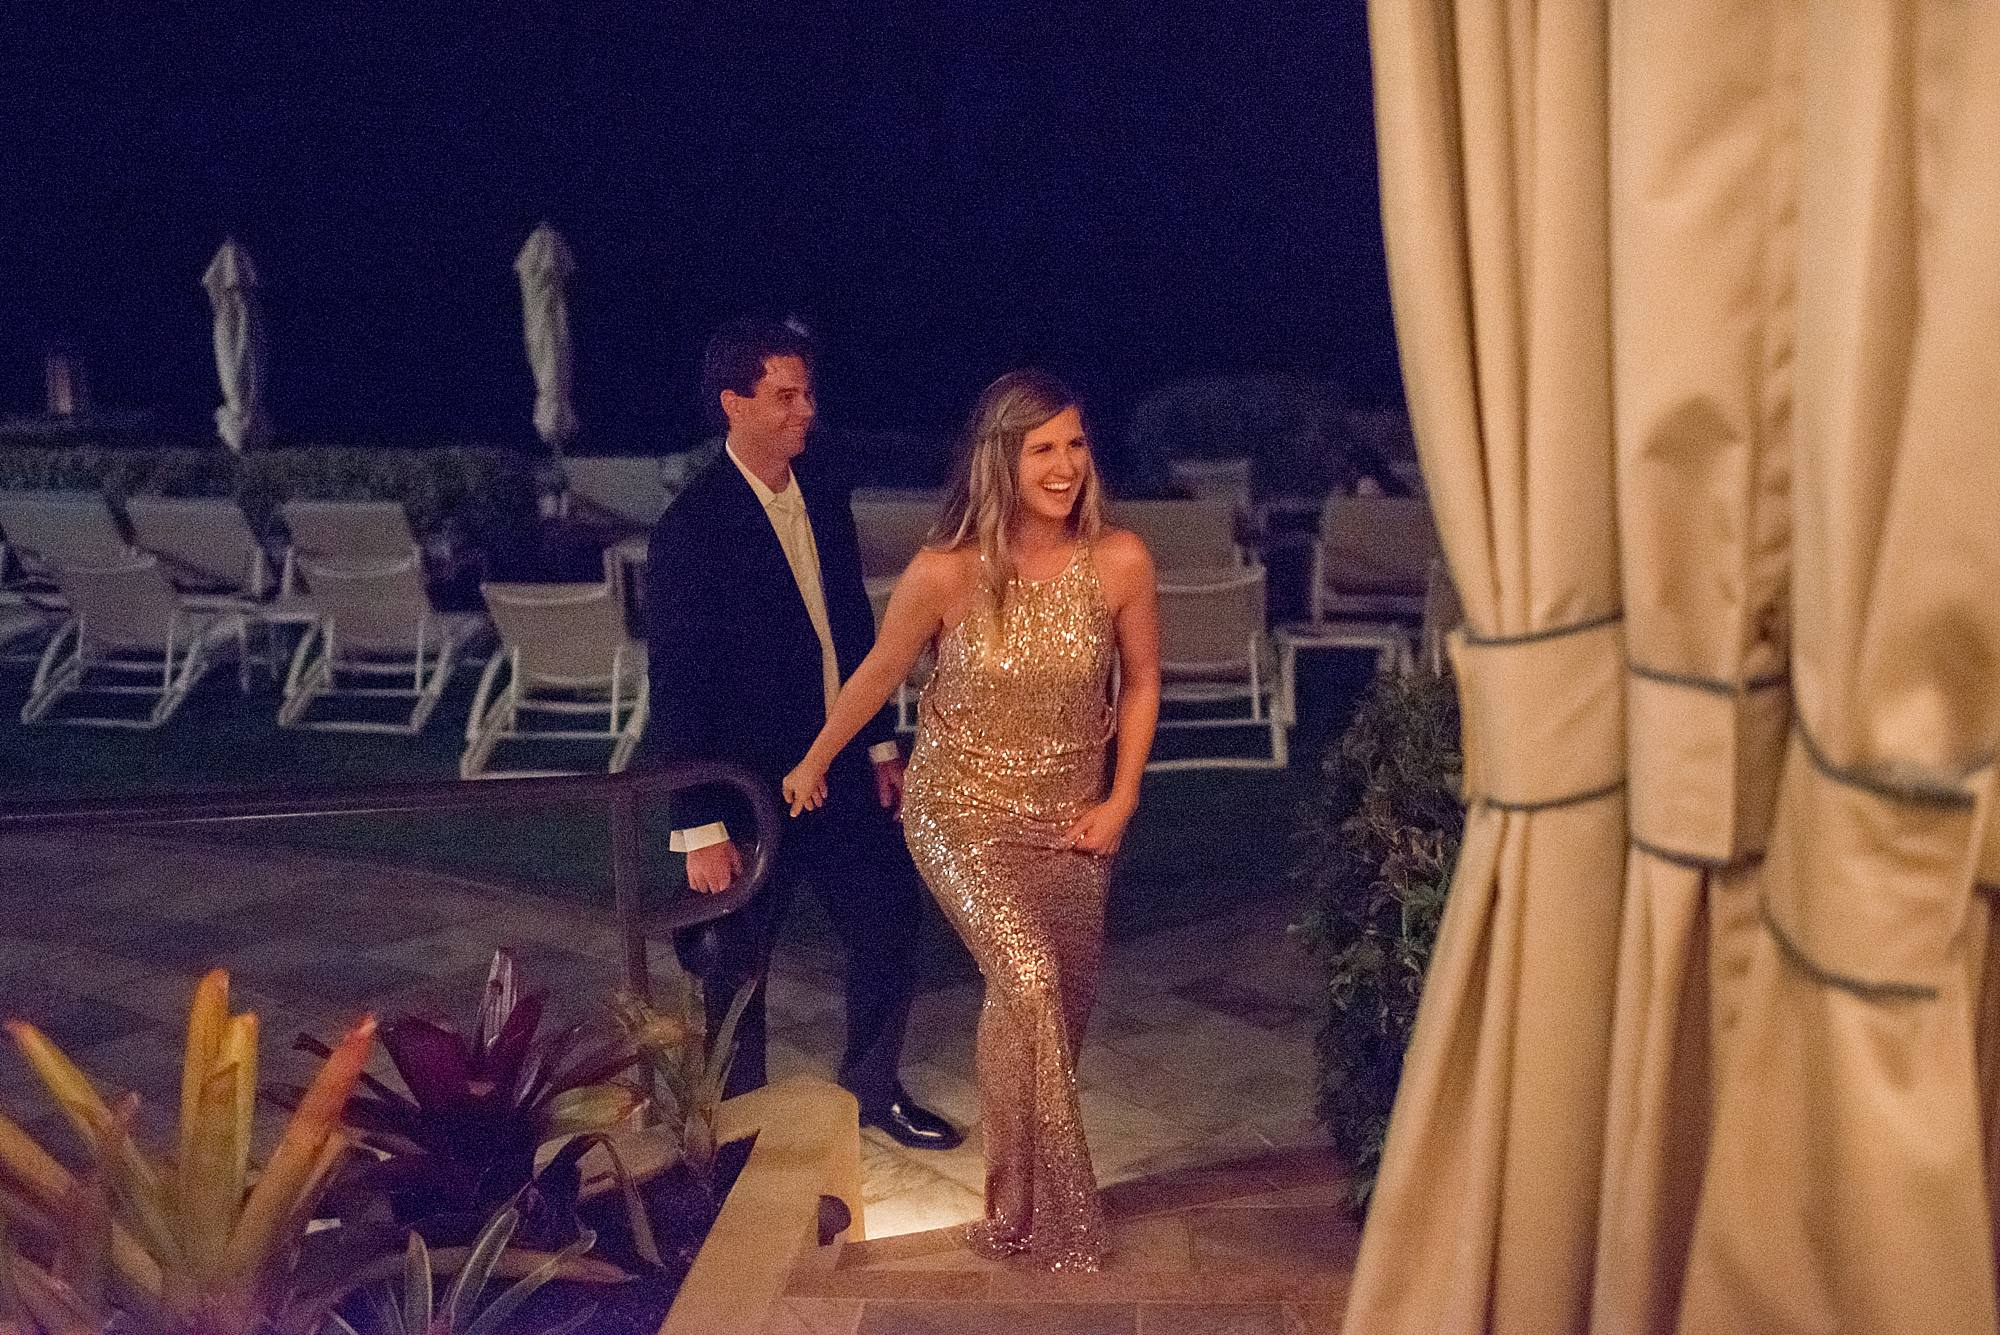 romantic-candlelit-proposal-at-the-four-seasons-maui_0044